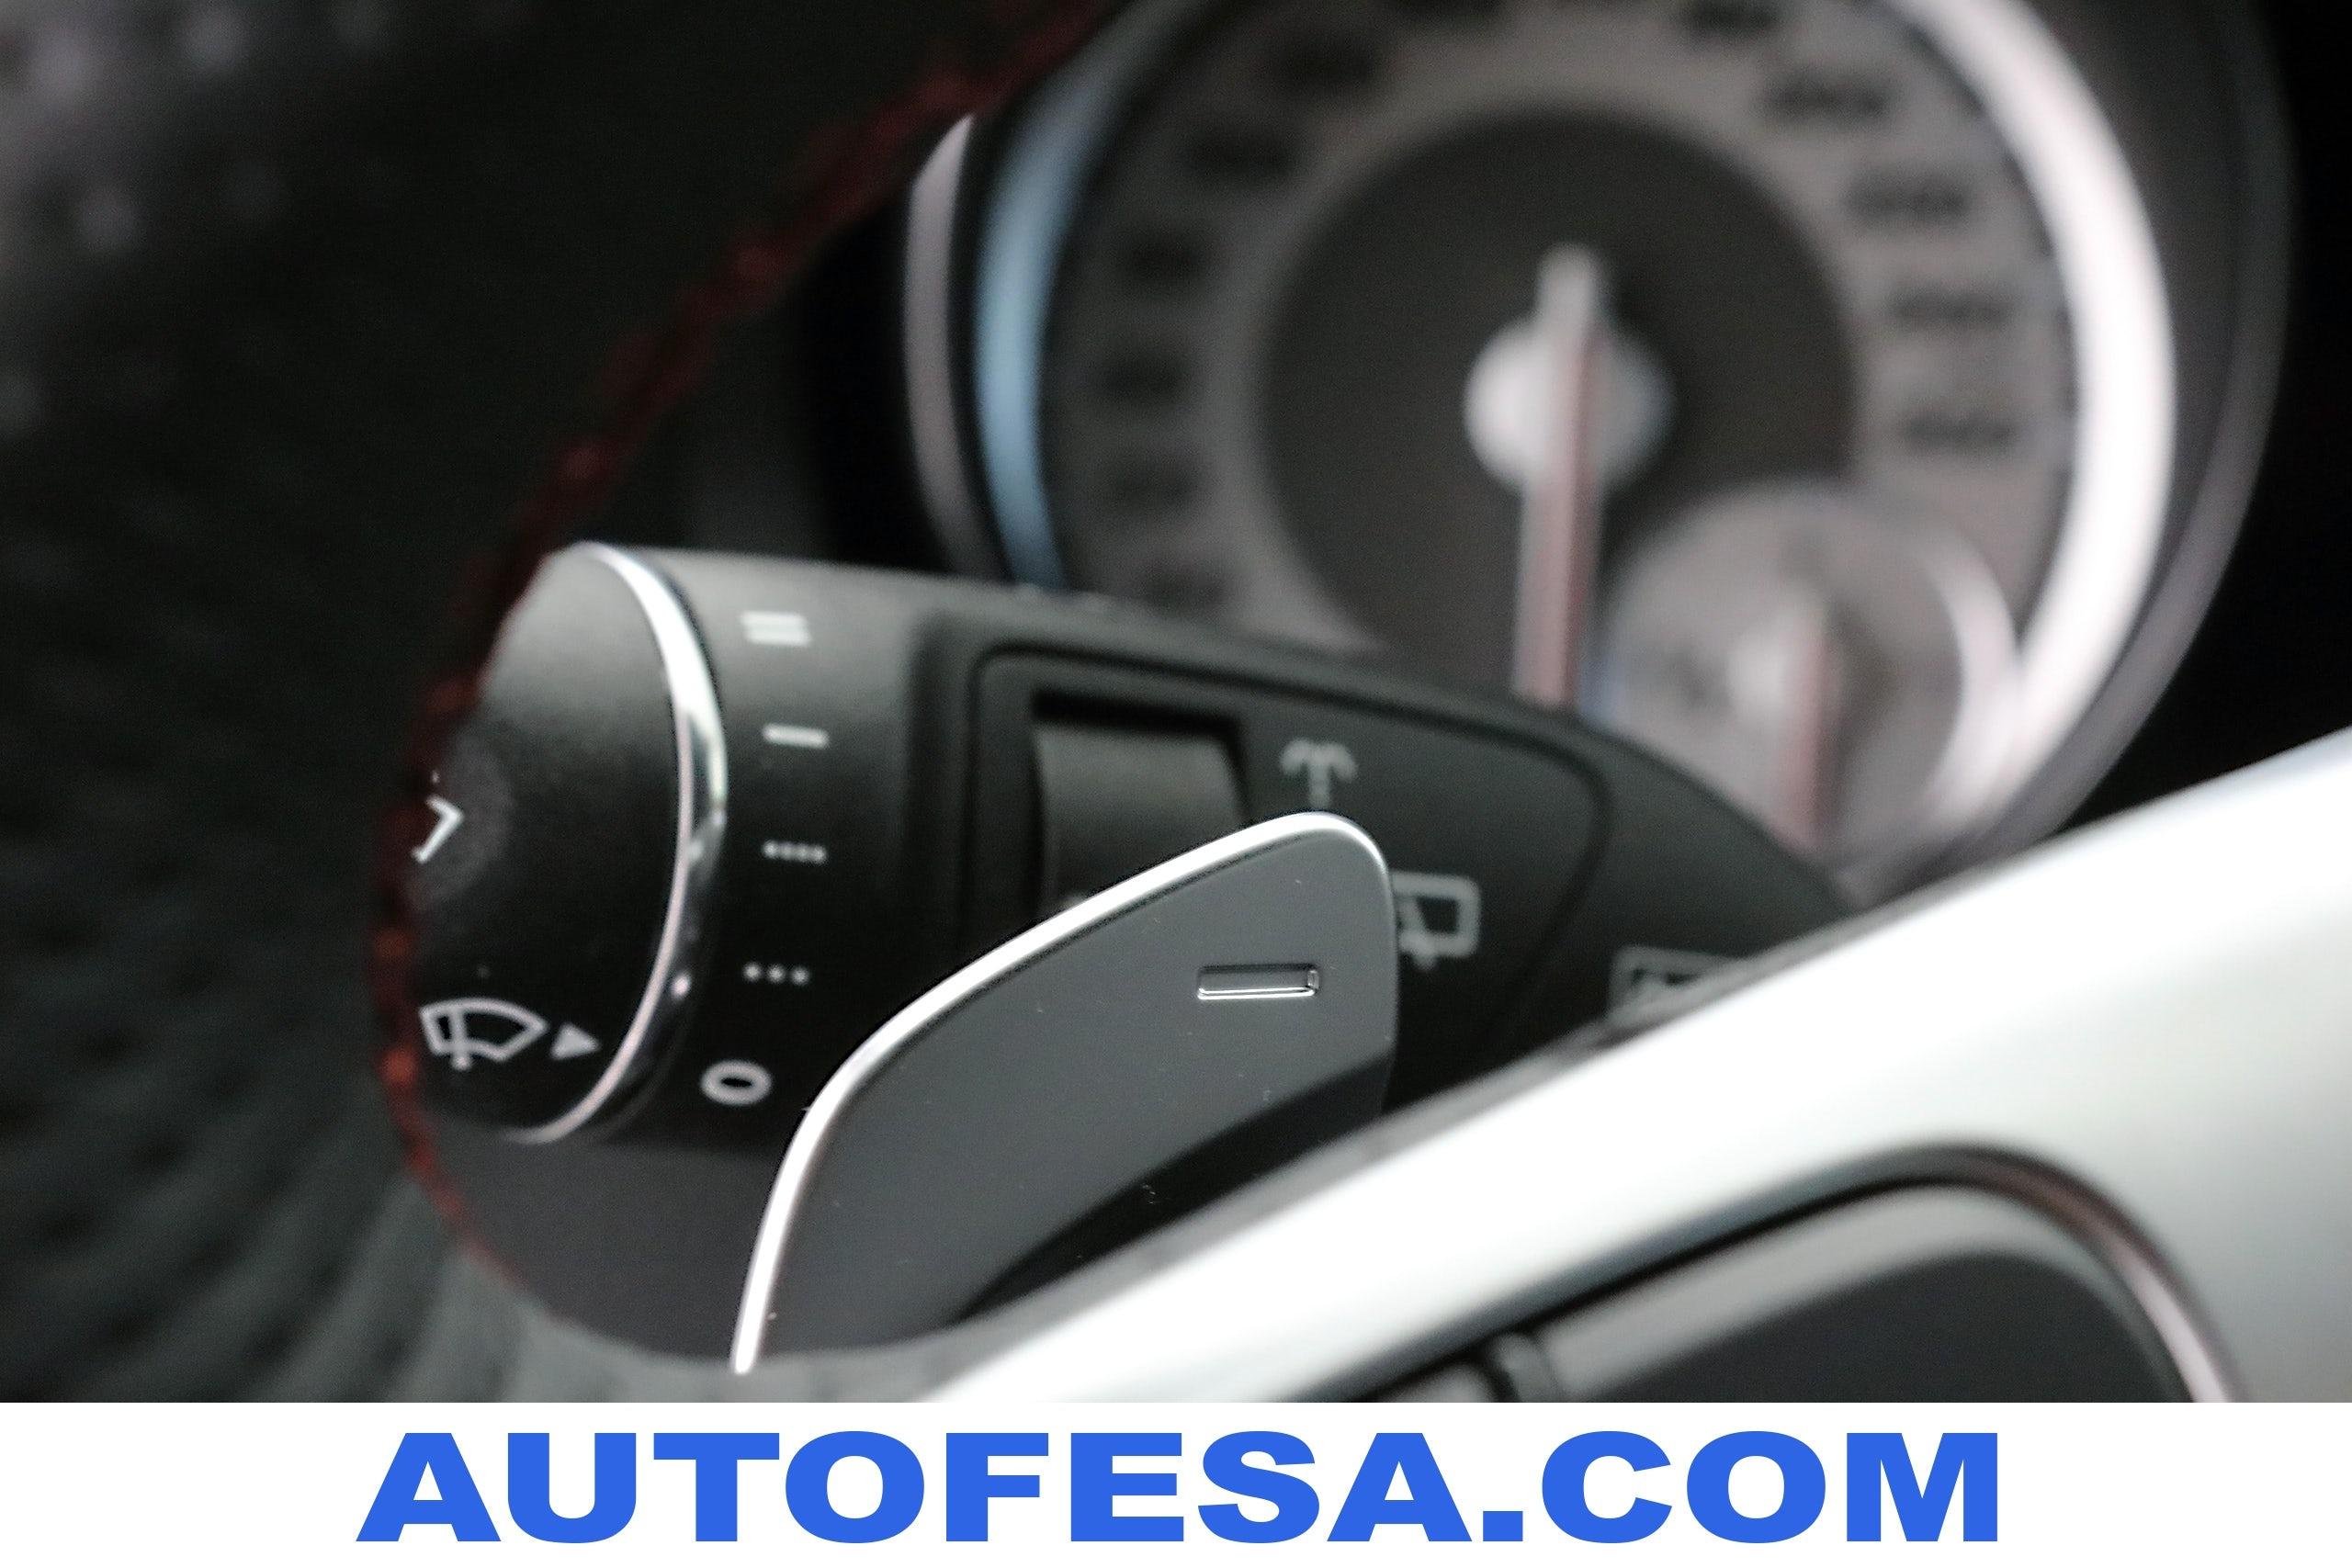 Mercedes-benz Cla 220 CLA 220 CDI 177cv 4p AMG Auto S/S - Foto 20